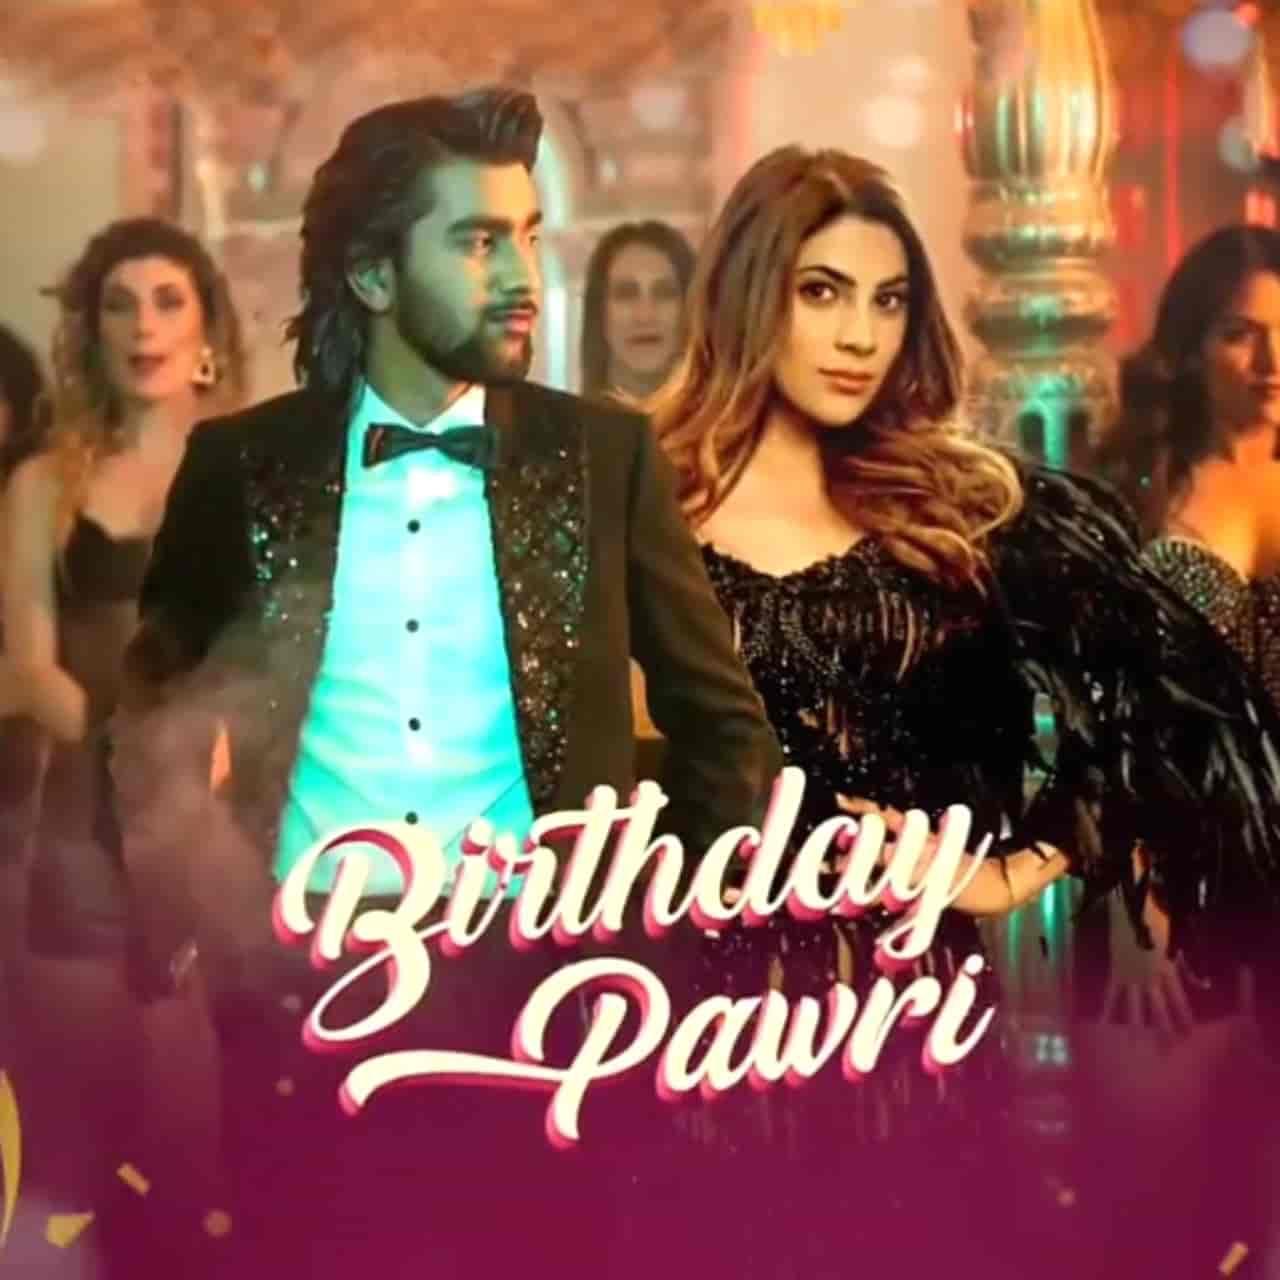 Birthday Pawri Party Song Lyrics Meet Bros